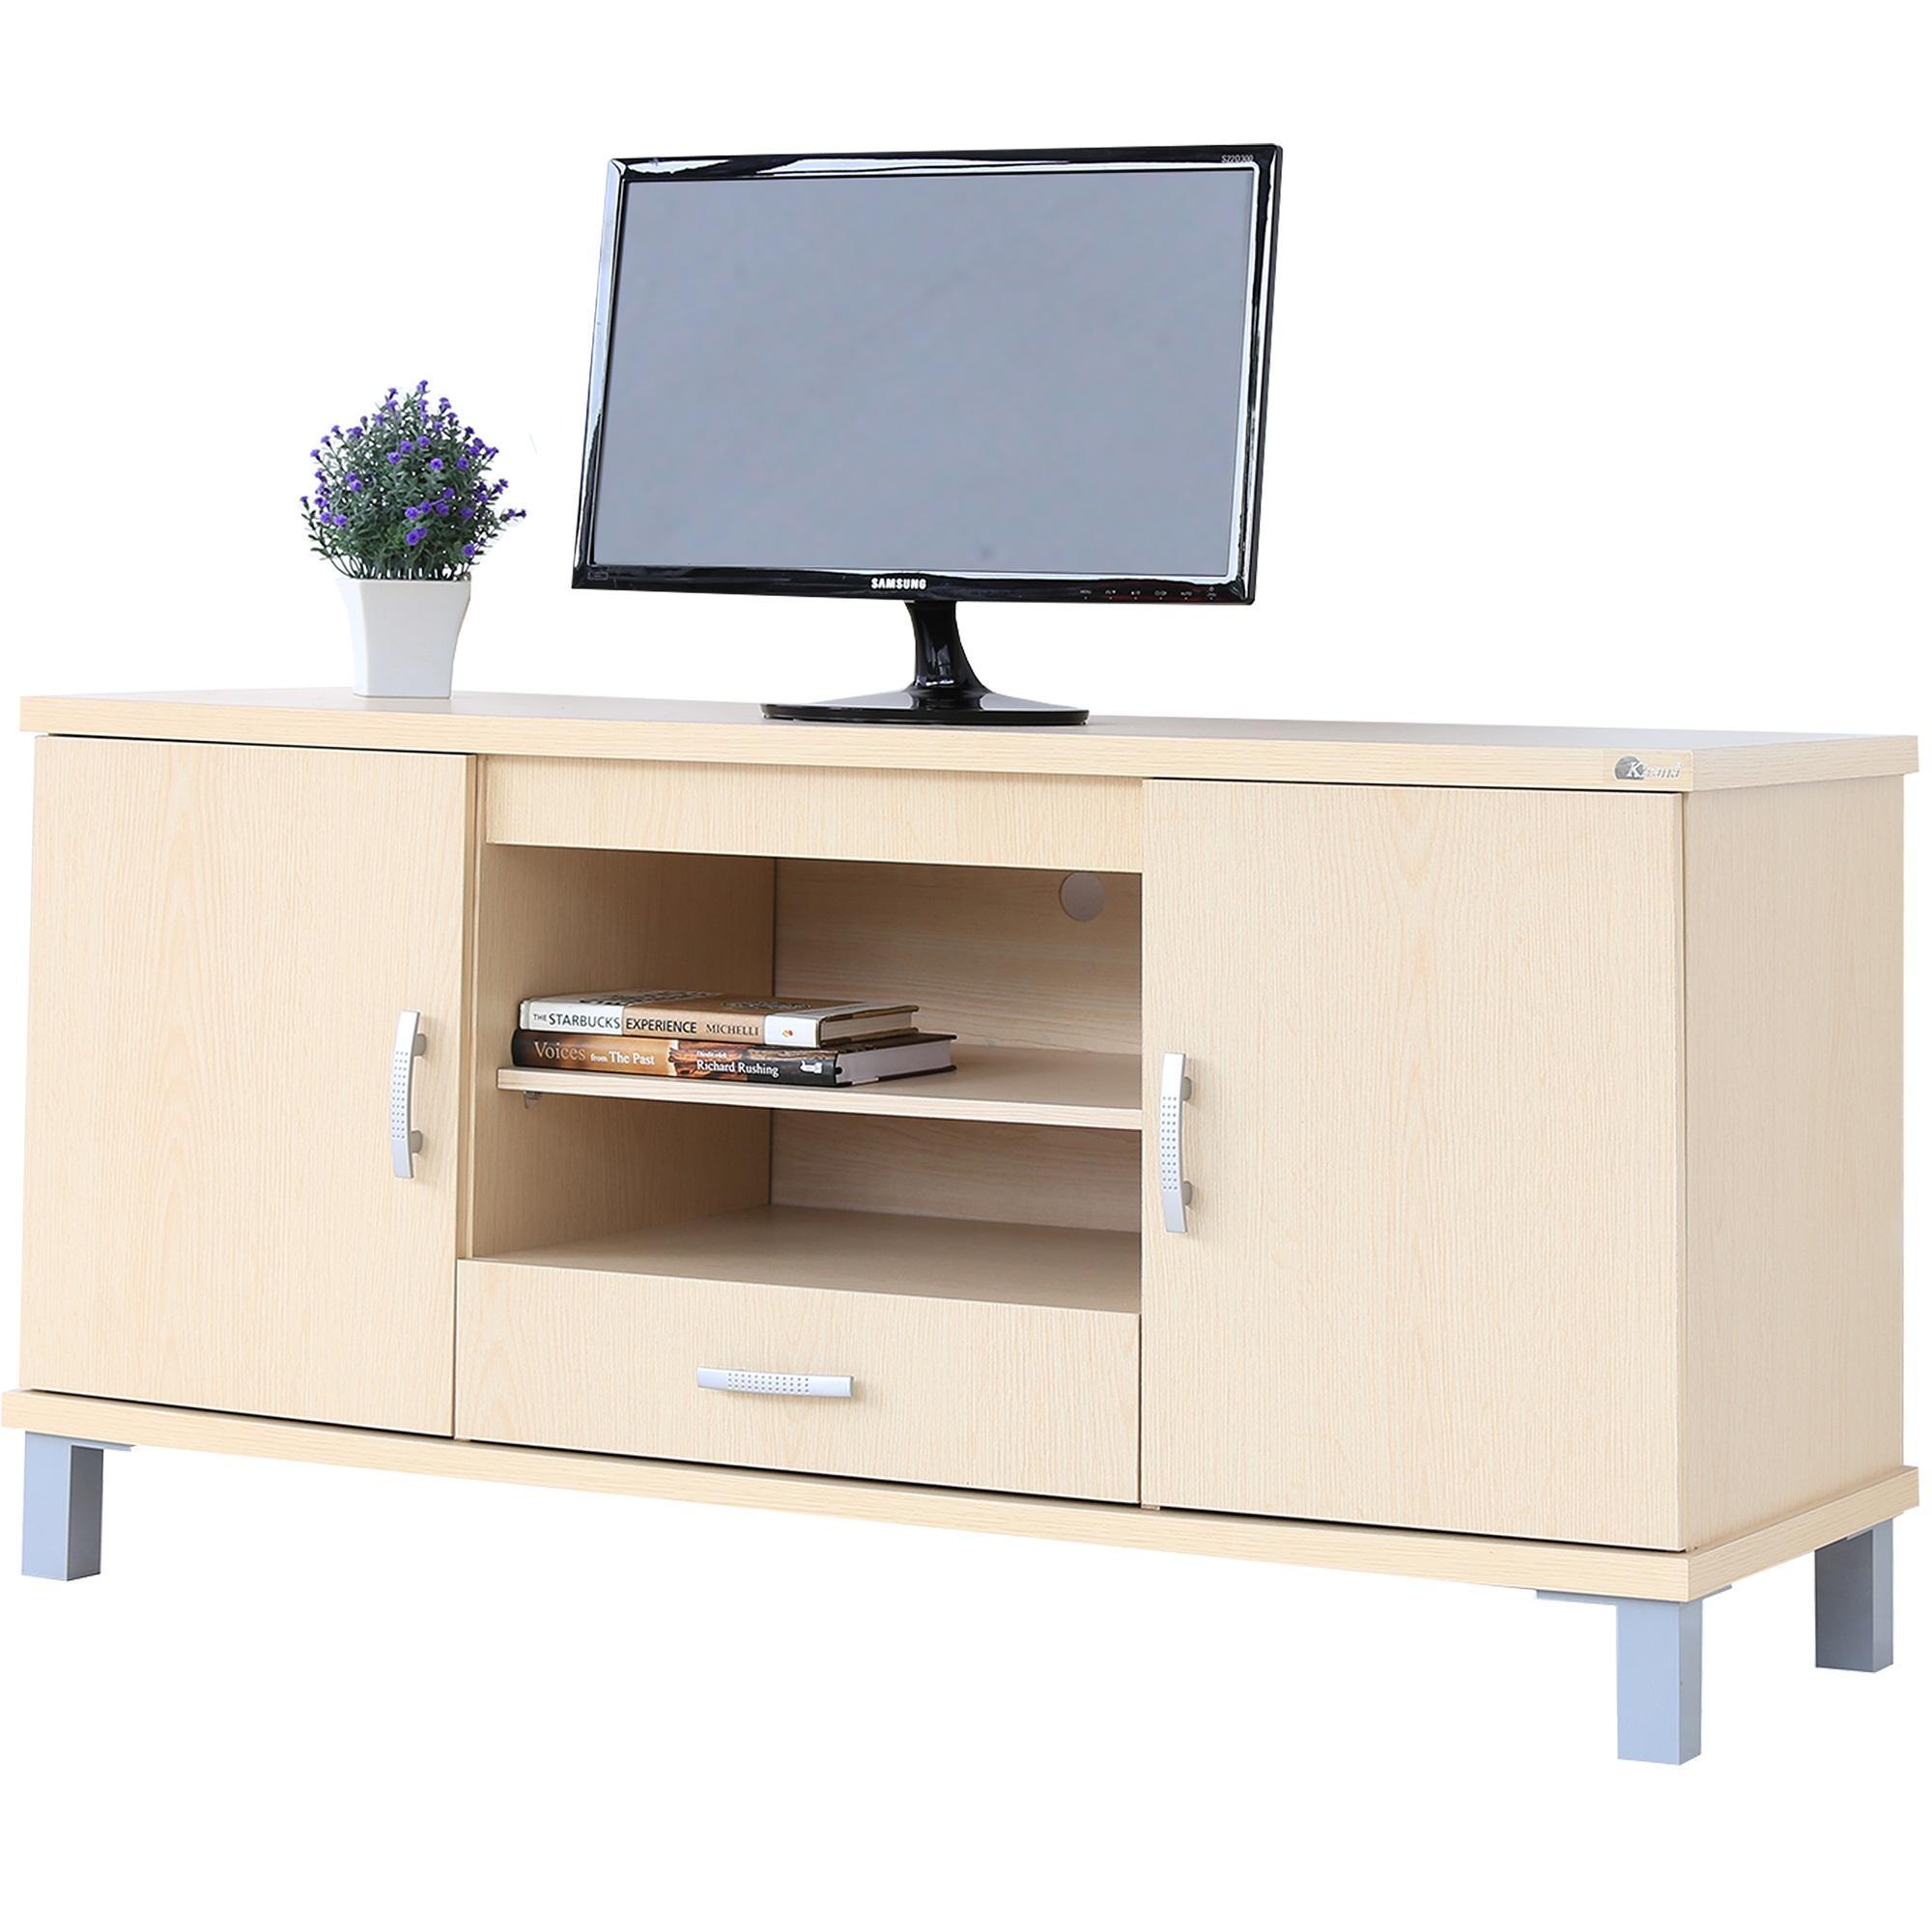 Kirana Furniture - AUDIO RAK / RAK TV / MEJA TV BF 828 WO